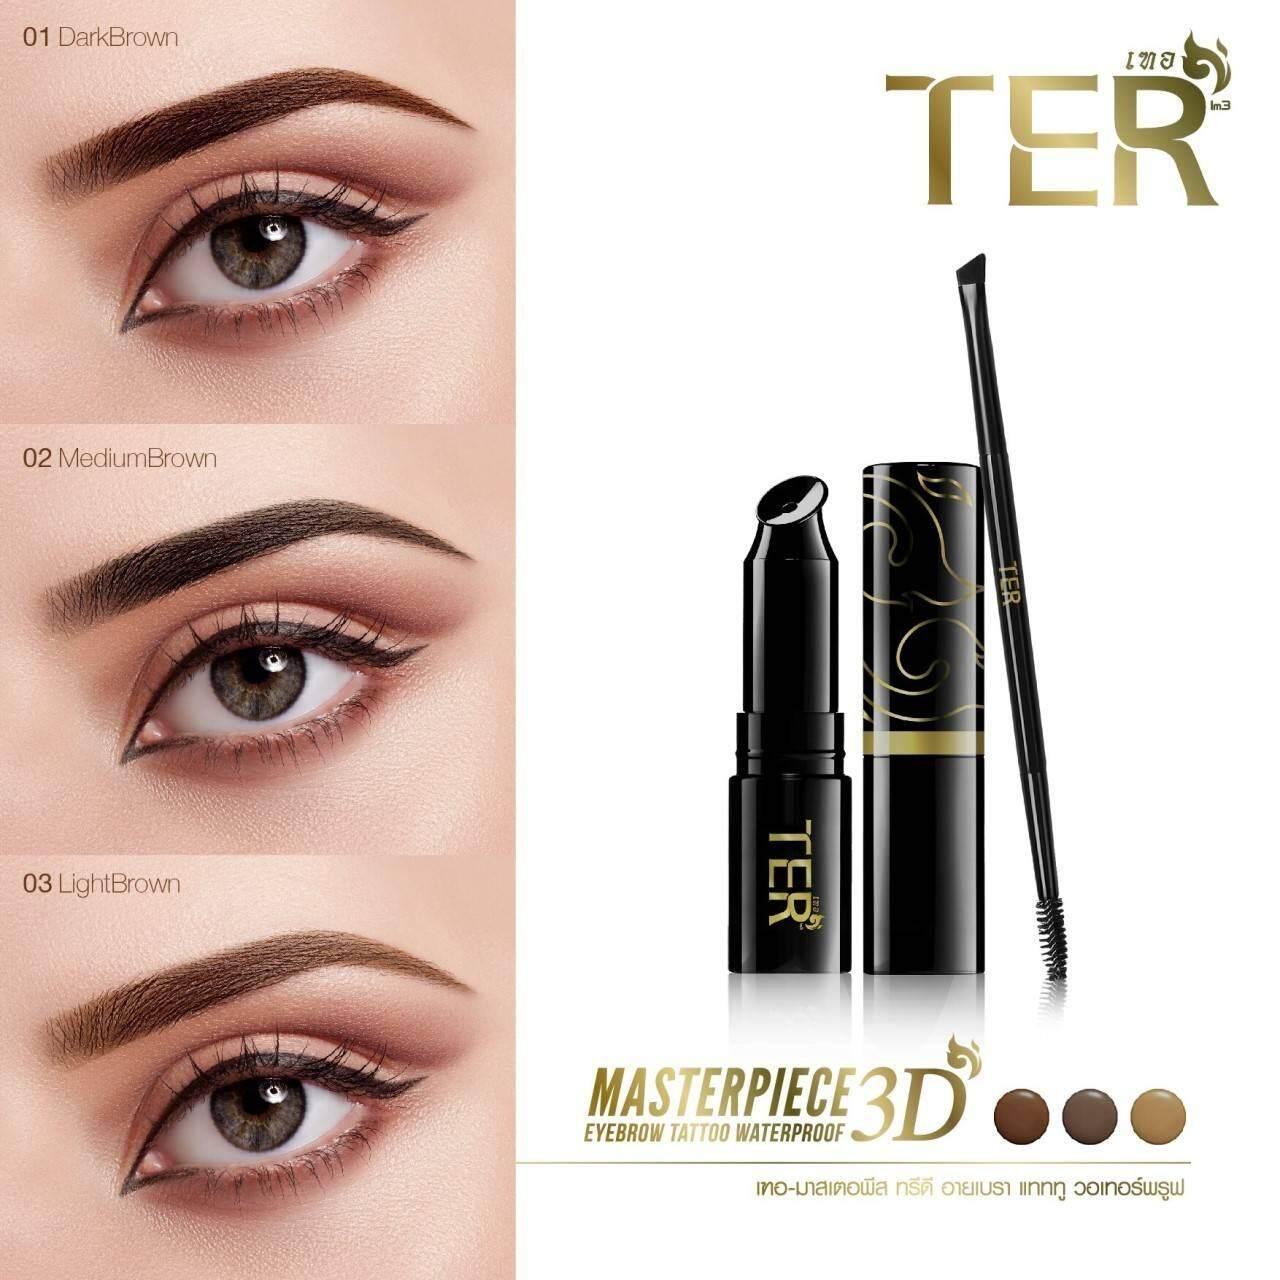 Ter masterpiece 3d eyebrow tattoo waterproof for Waterproof eyebrow tattoo